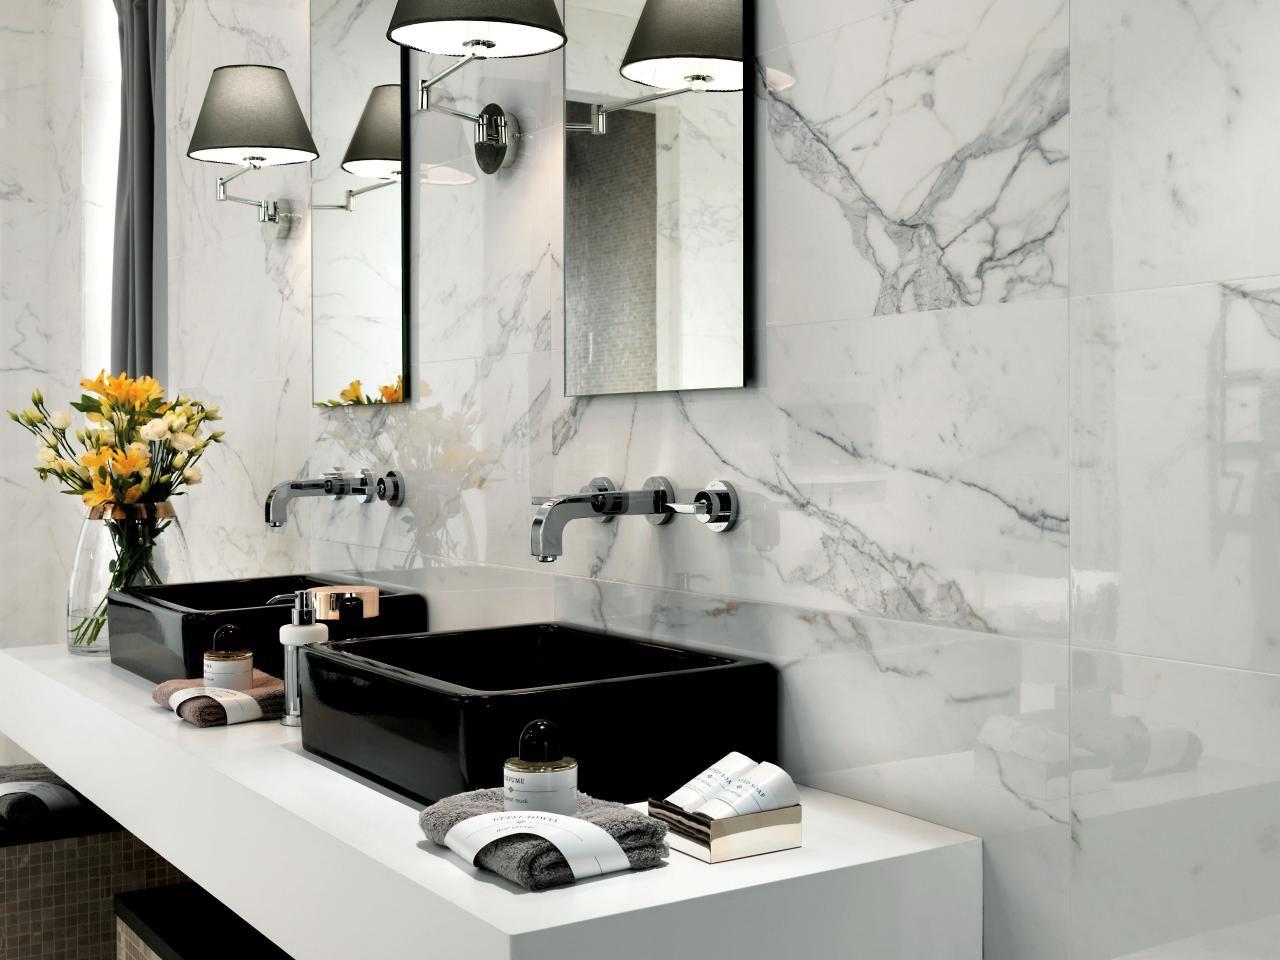 bathroom design ideas | Flooring ideas, Bathroom designs and Tile design